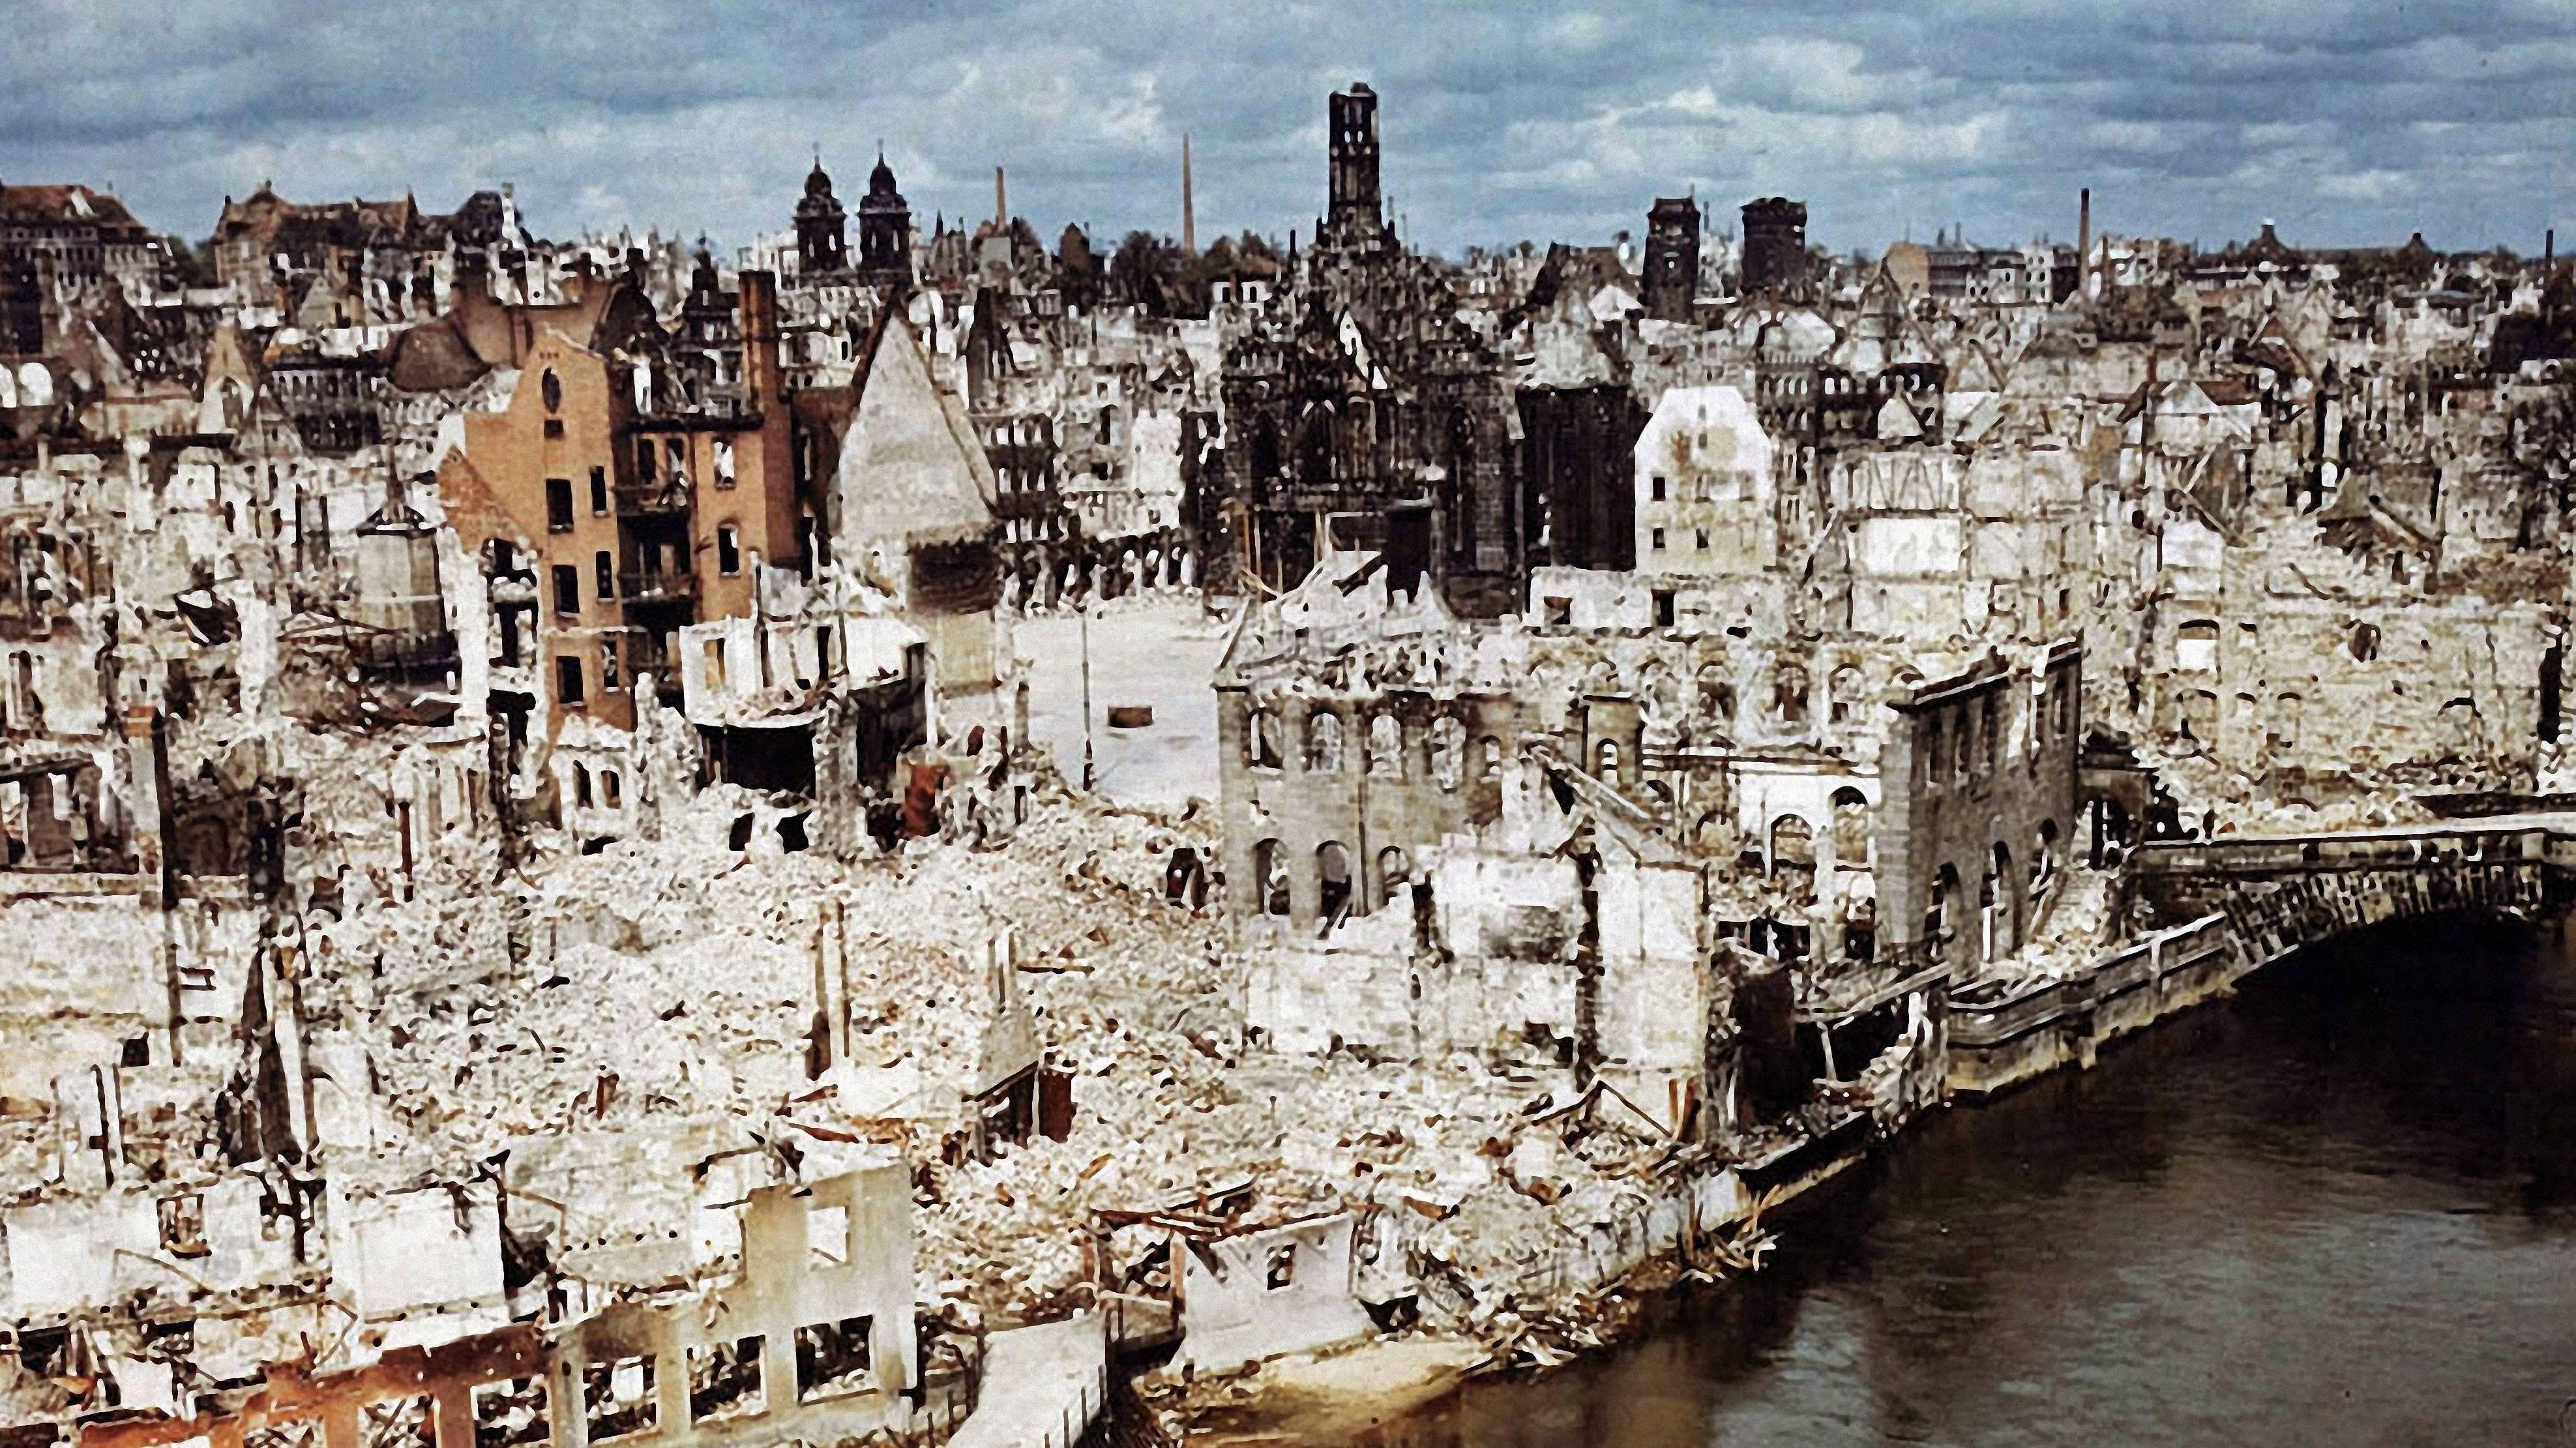 Blick auf die zerstörte Nürnberger Altstadt 1945